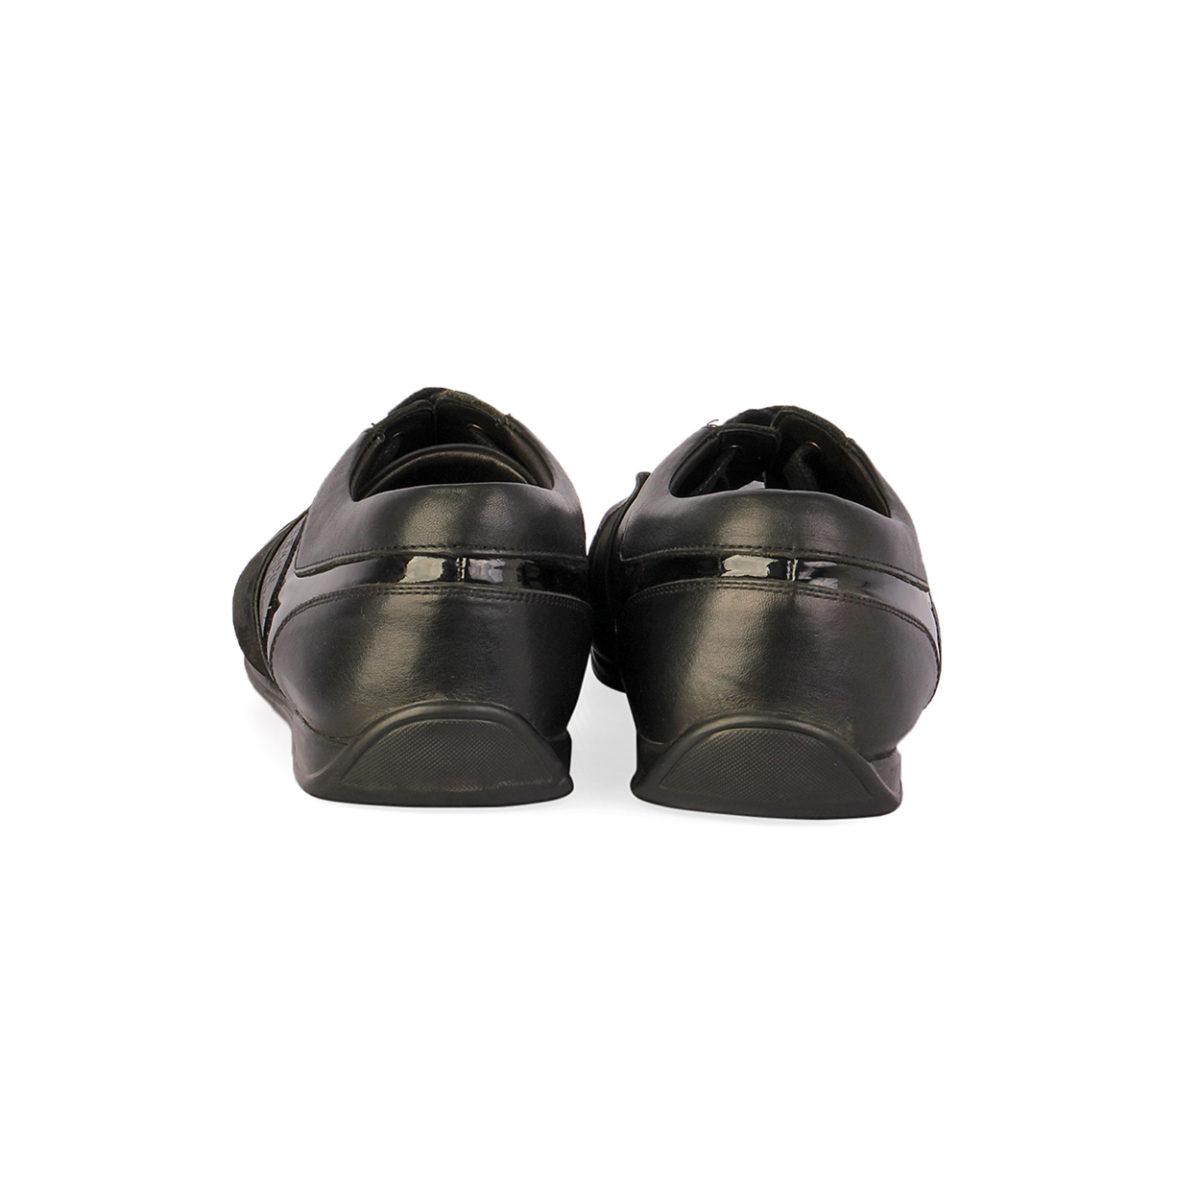 versace dress shoes. versace collections versace dress shoes